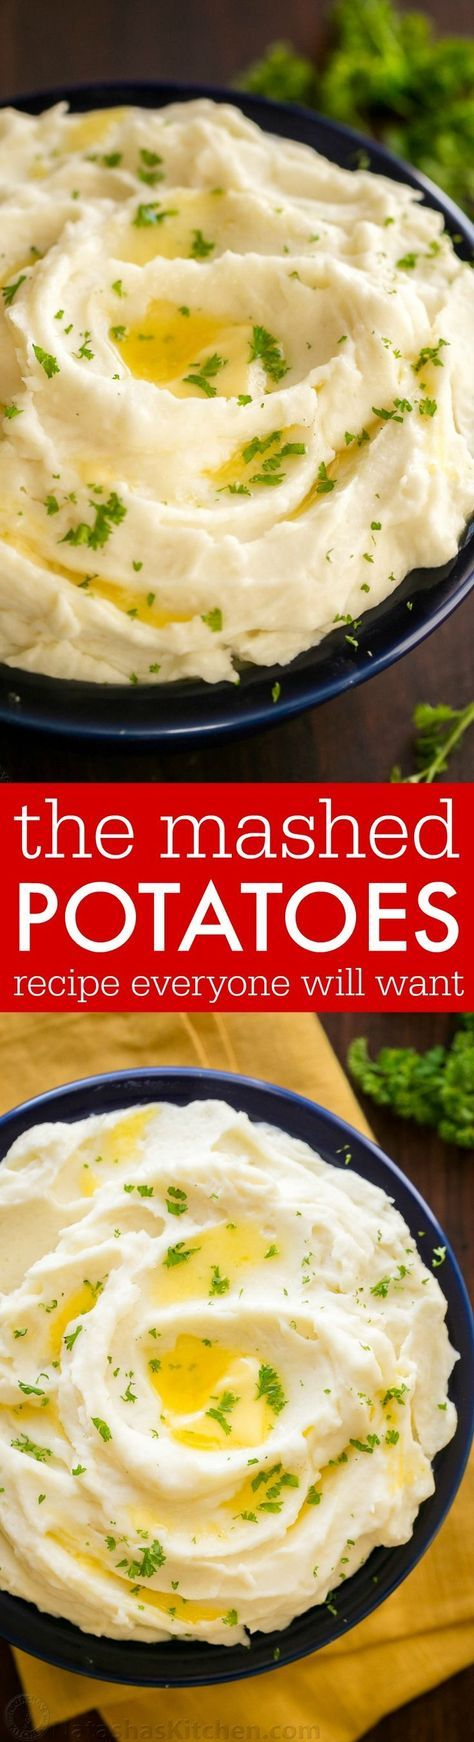 These creamy mashed potatoes are shockingly good! Learn the secrets to the best mashed potatoes recipe. Whipped, velvety and holiday worthy mashed potatoes! | http://natashaskitchen.com